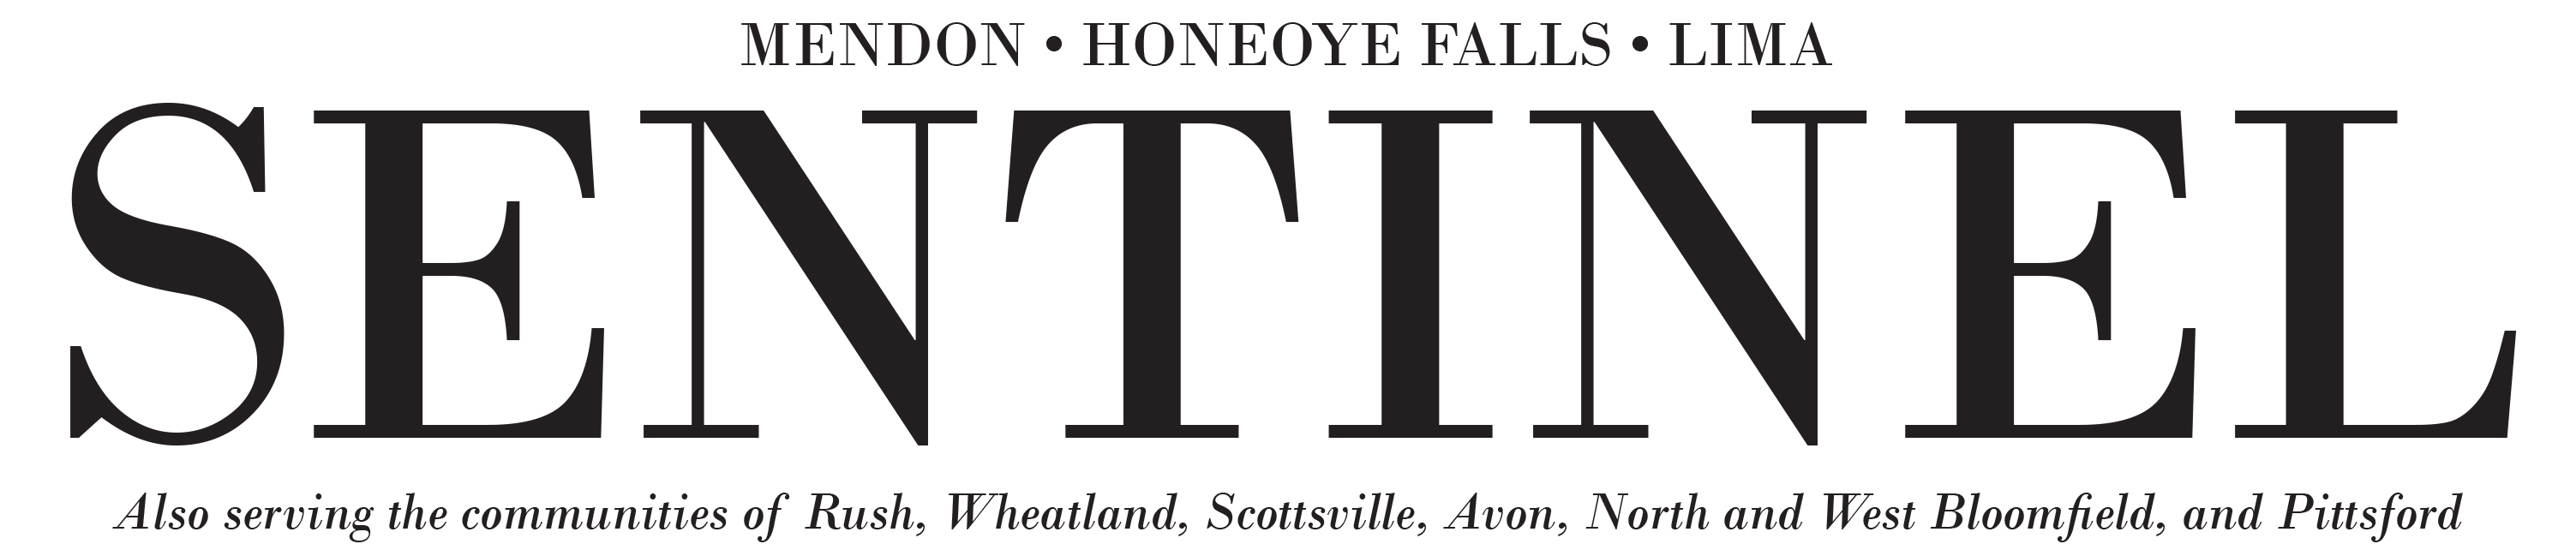 Mendon Honeoye Falls Lima Sentinel